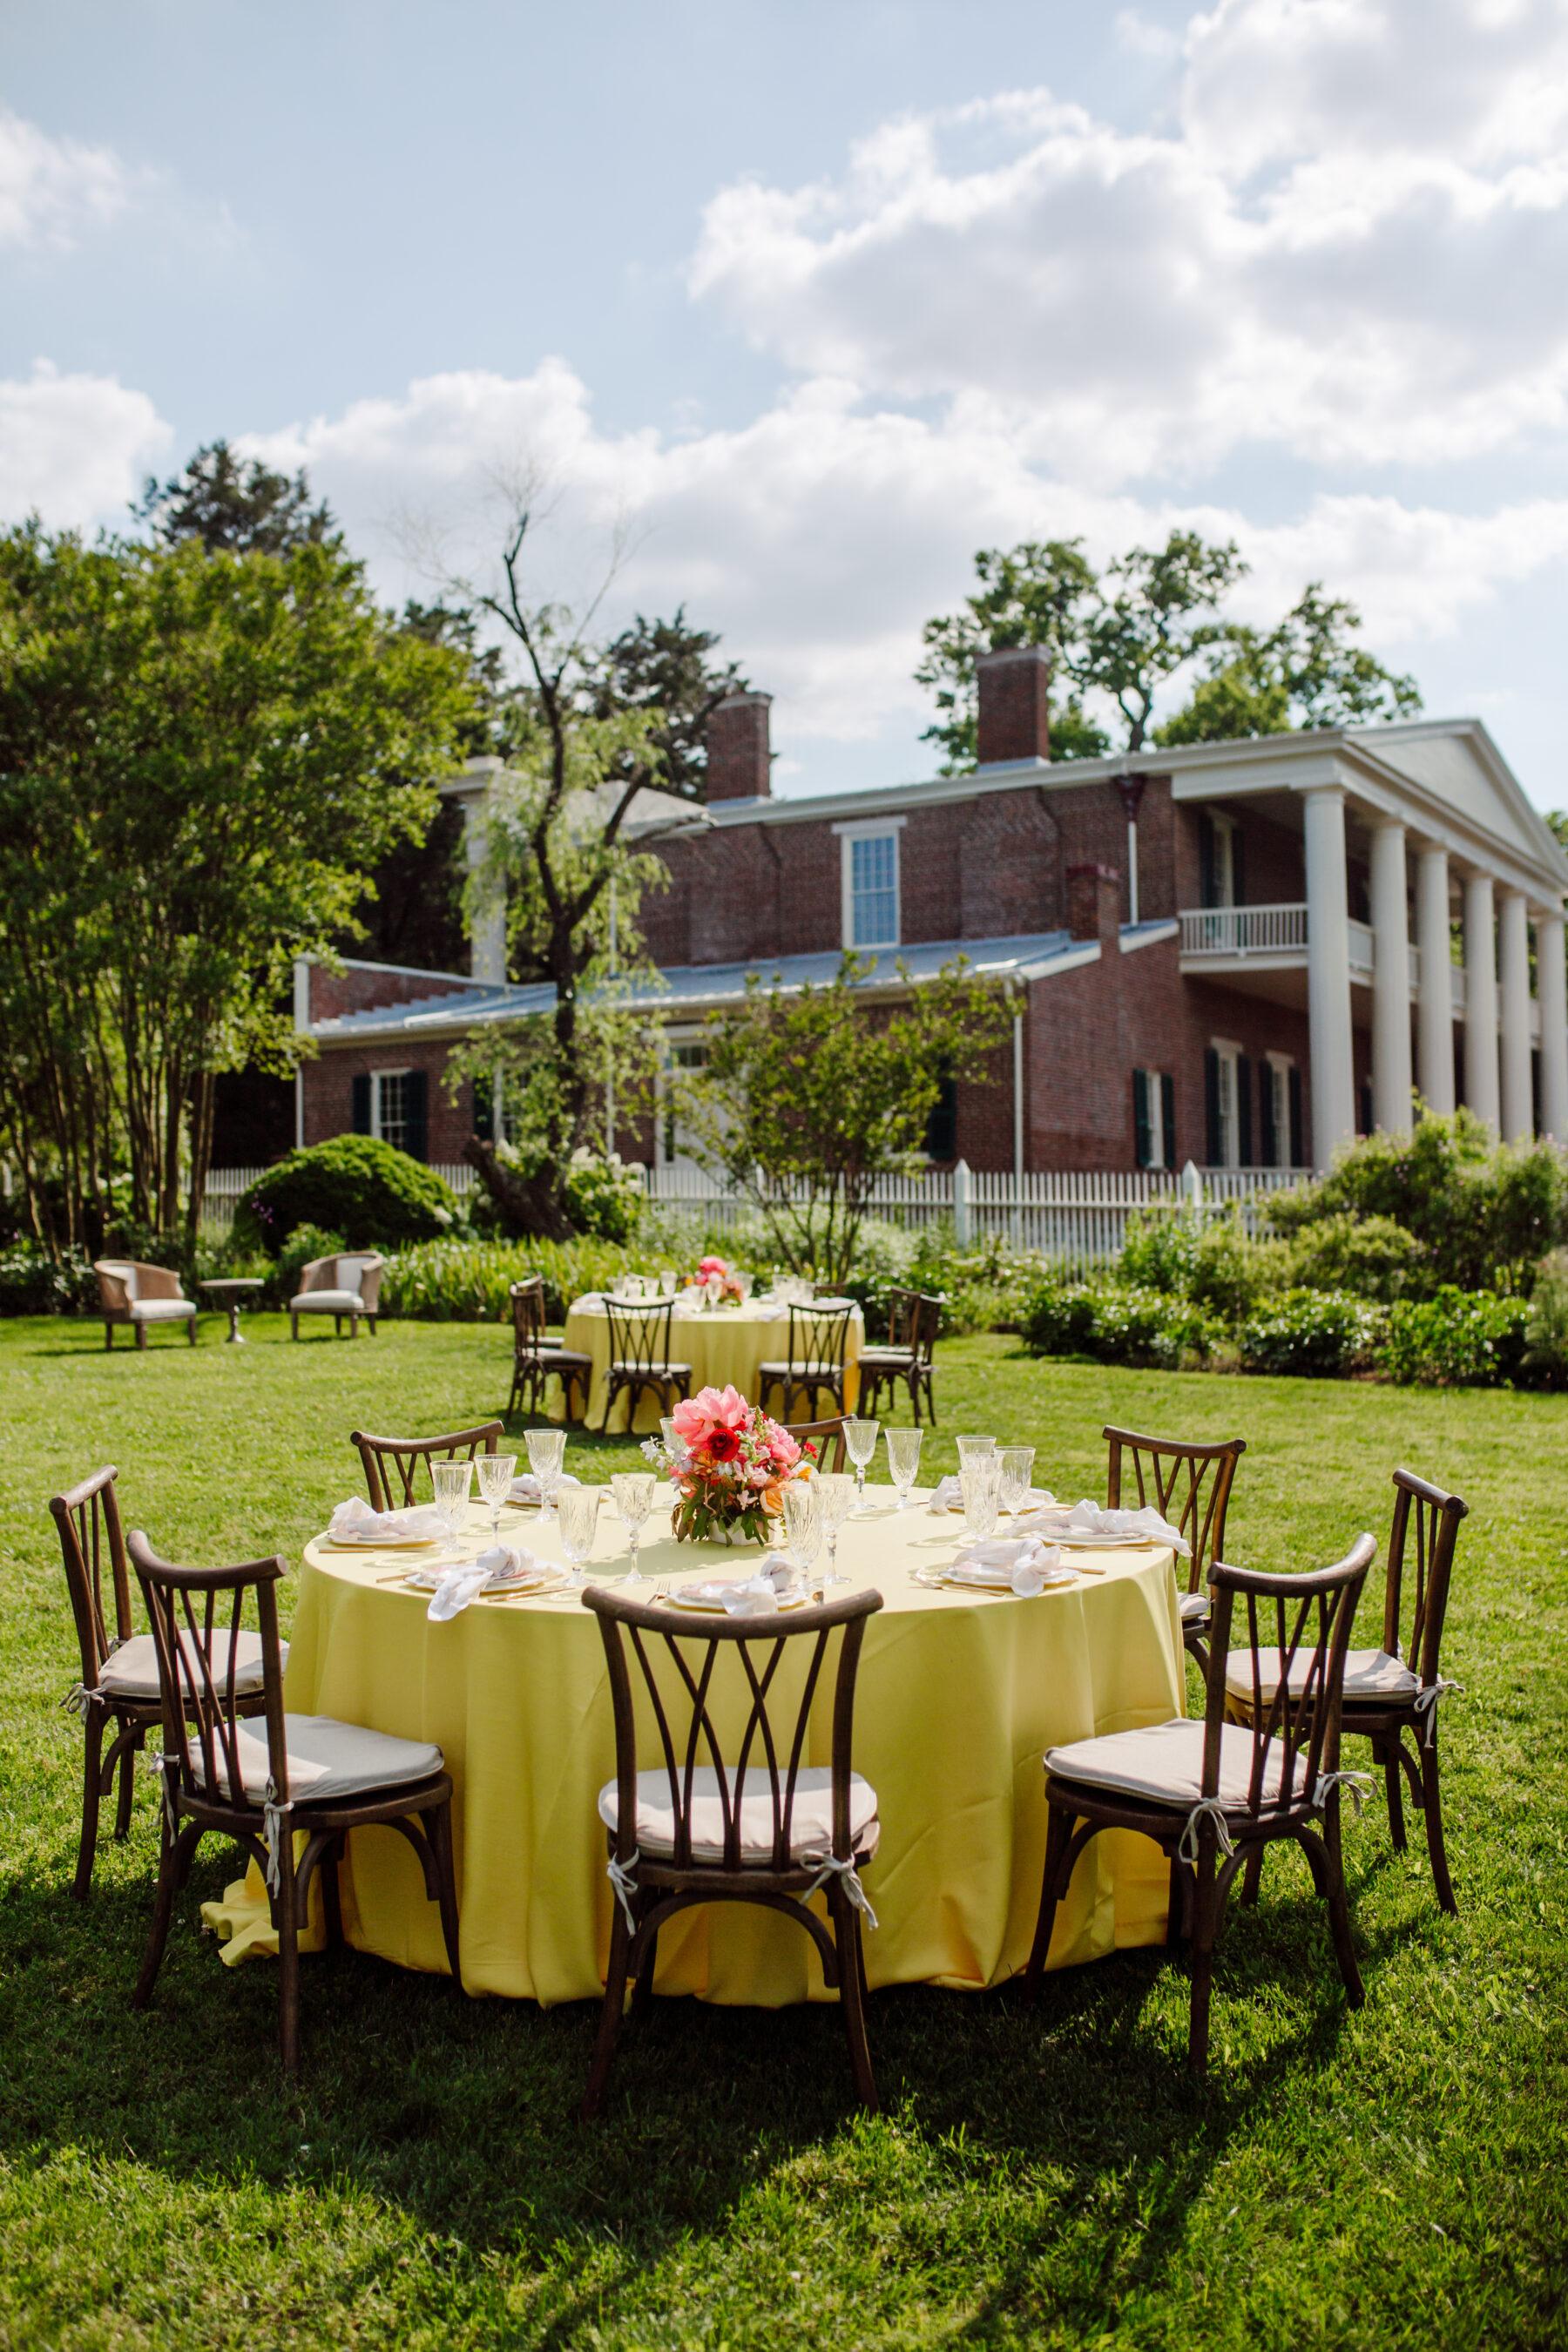 Outdoor wedding reception set up: TWESA's new consumer website launch featured on Nashville Bride Guide